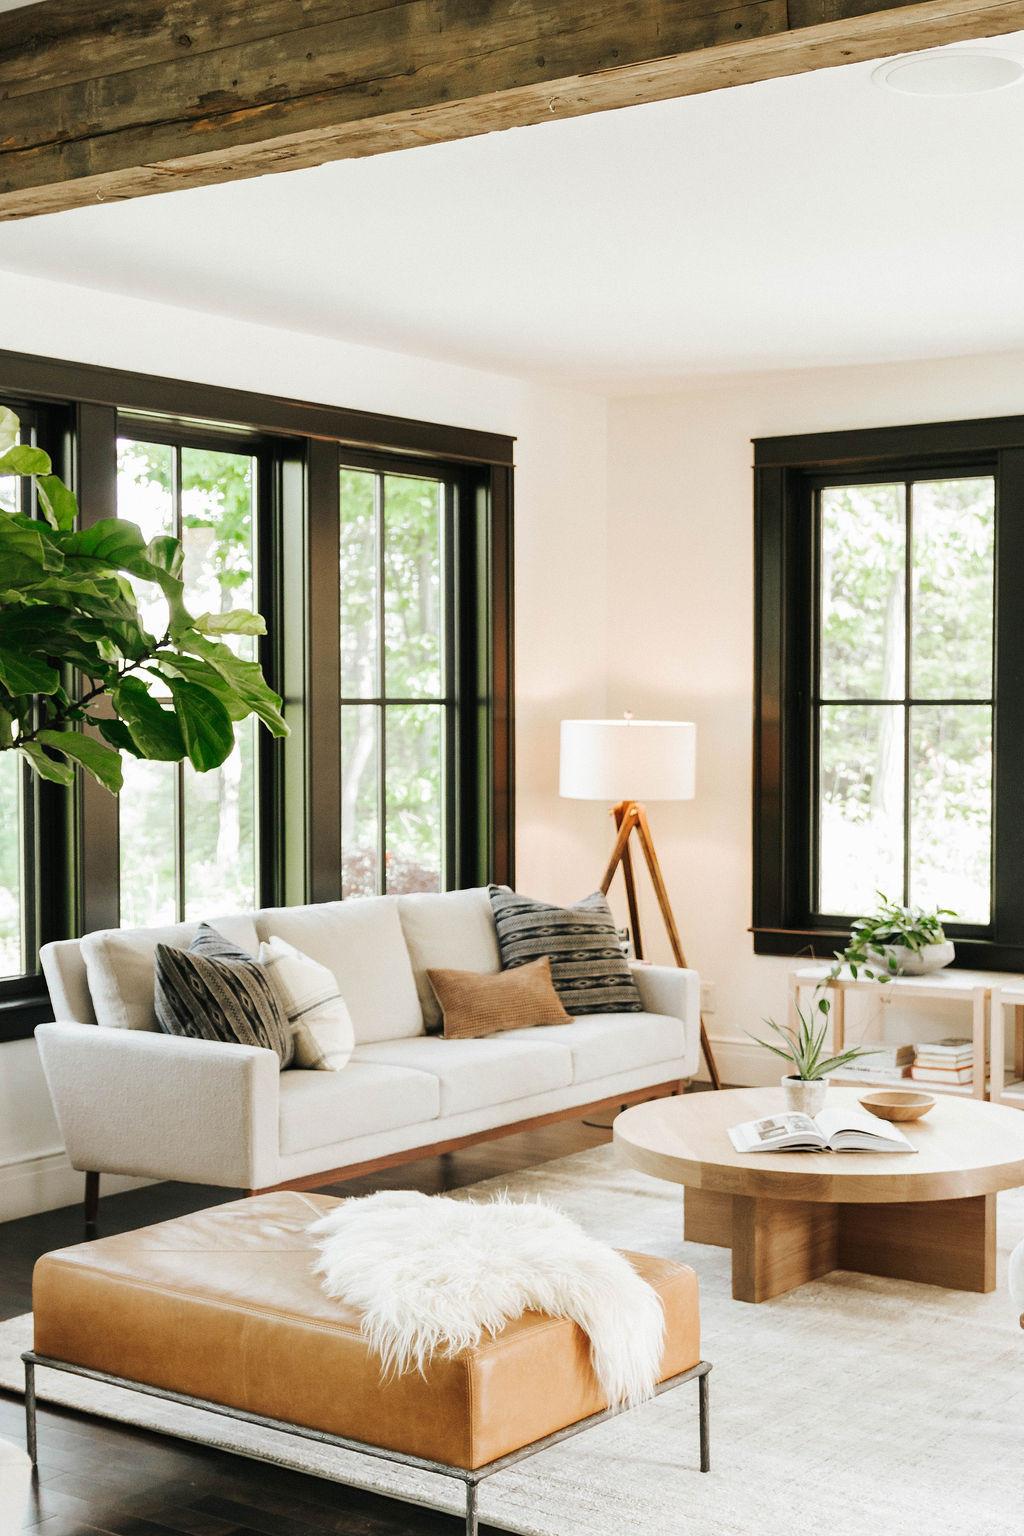 Lauren Figueroa Interior Design | Grand Rapids, Michigan